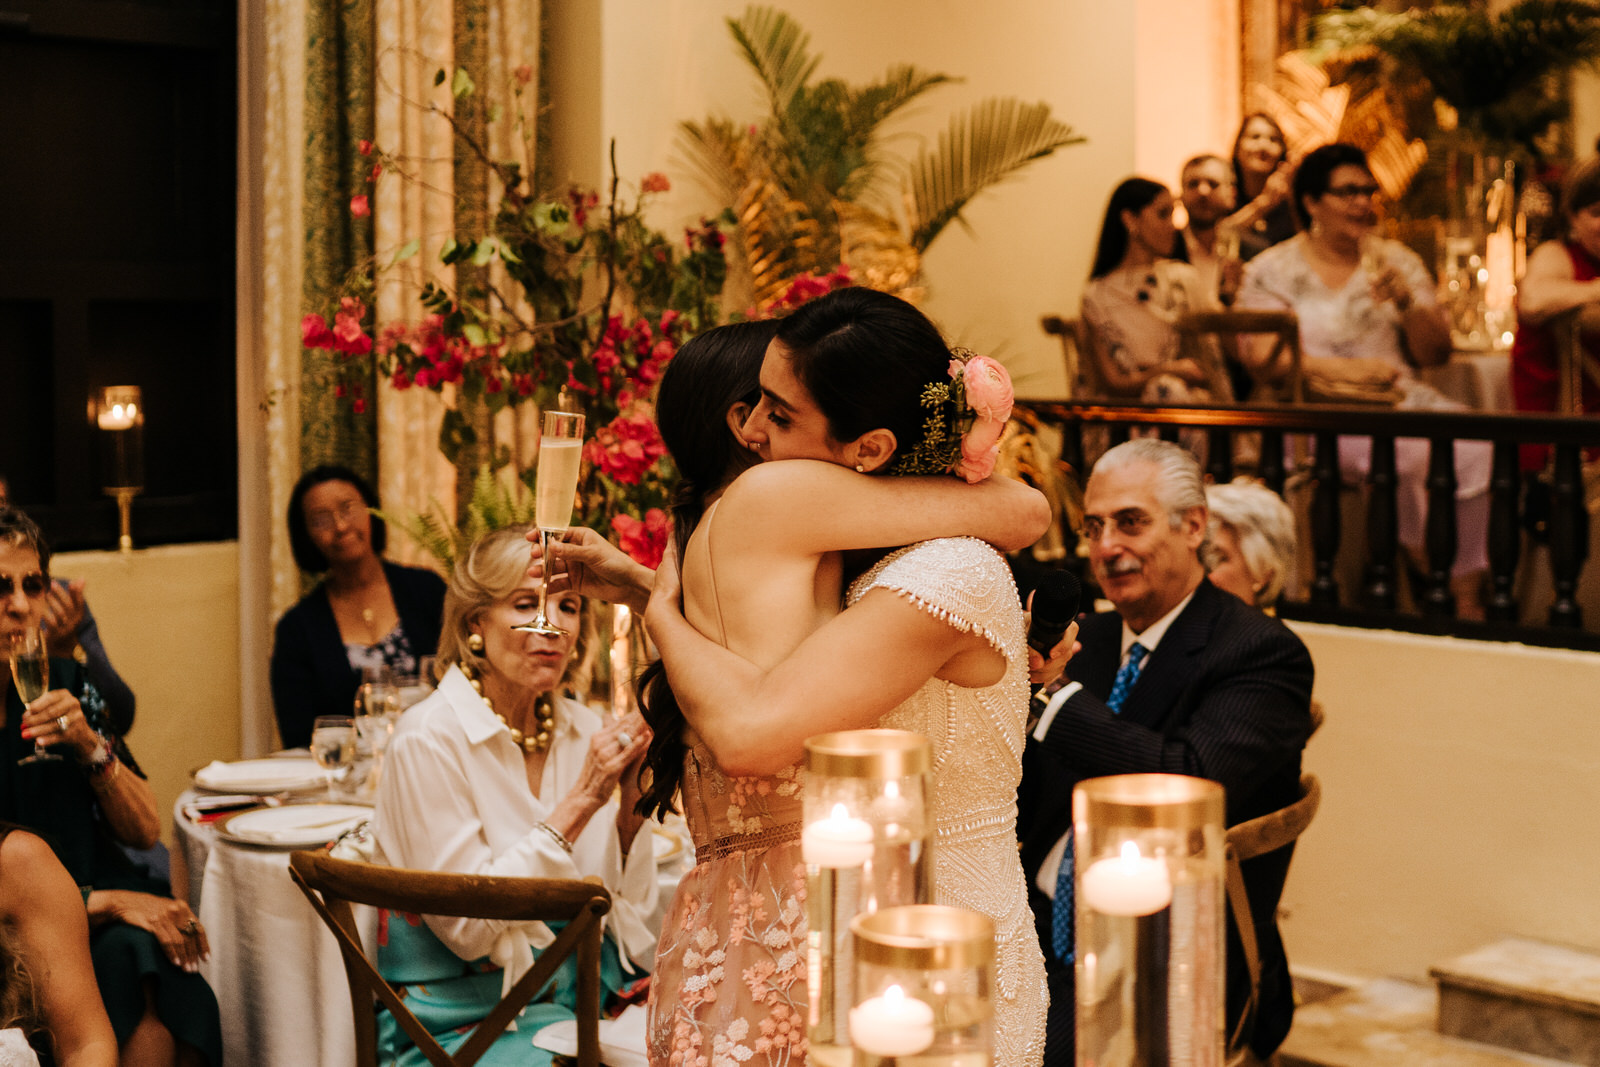 Bride hugs her best friend after she finishes her wedding speech